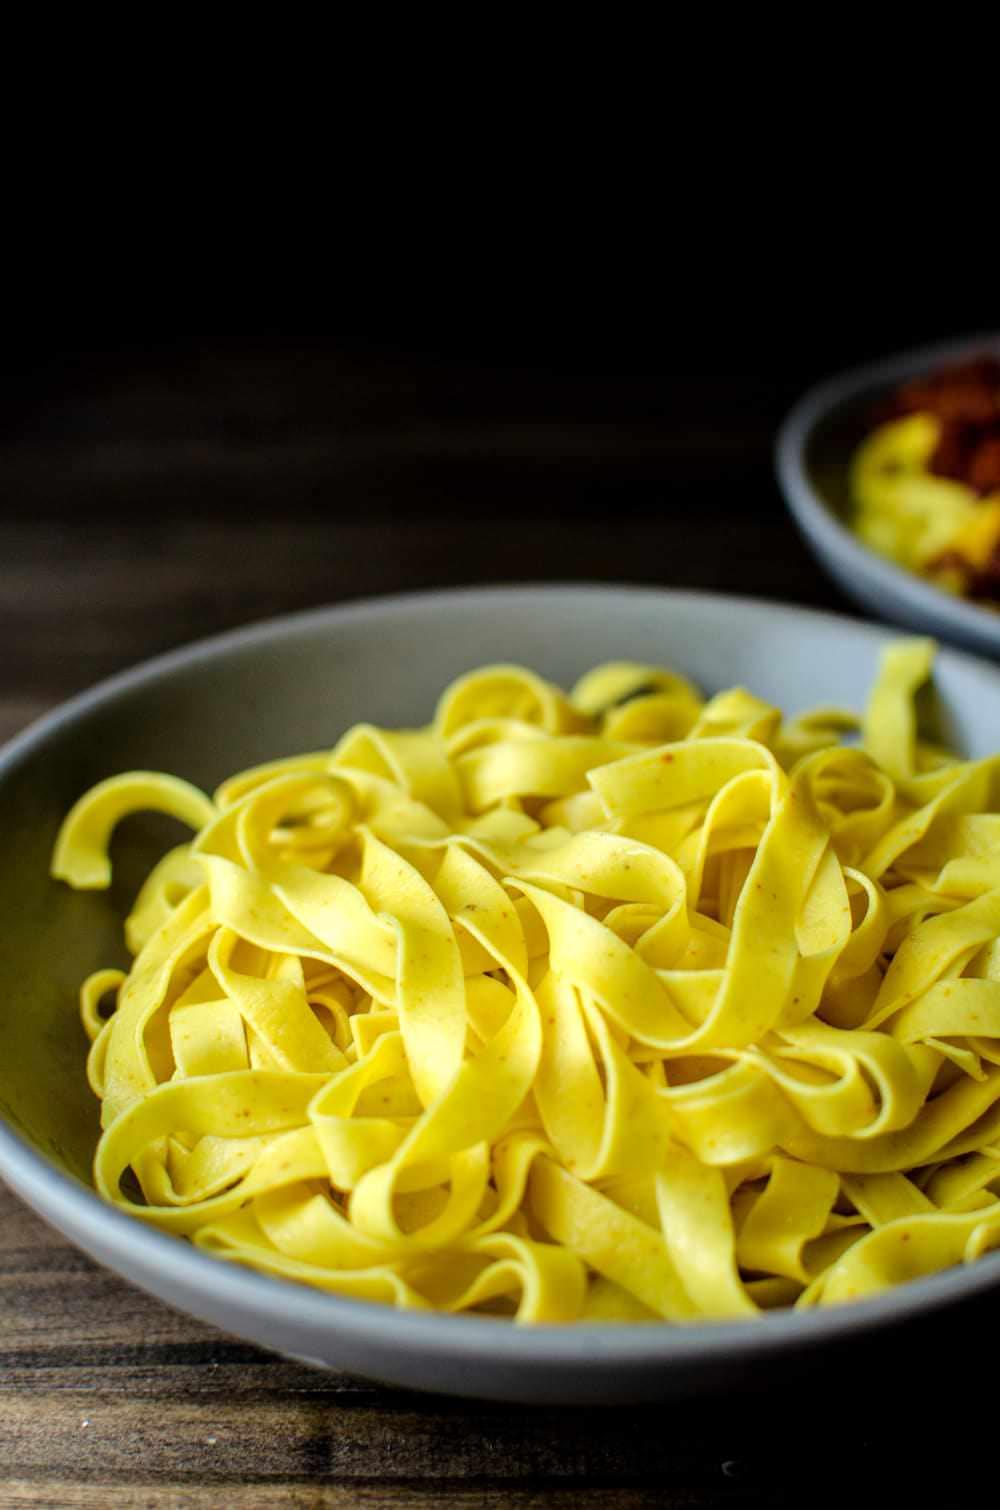 how to get rid of machine oil in pasta machine